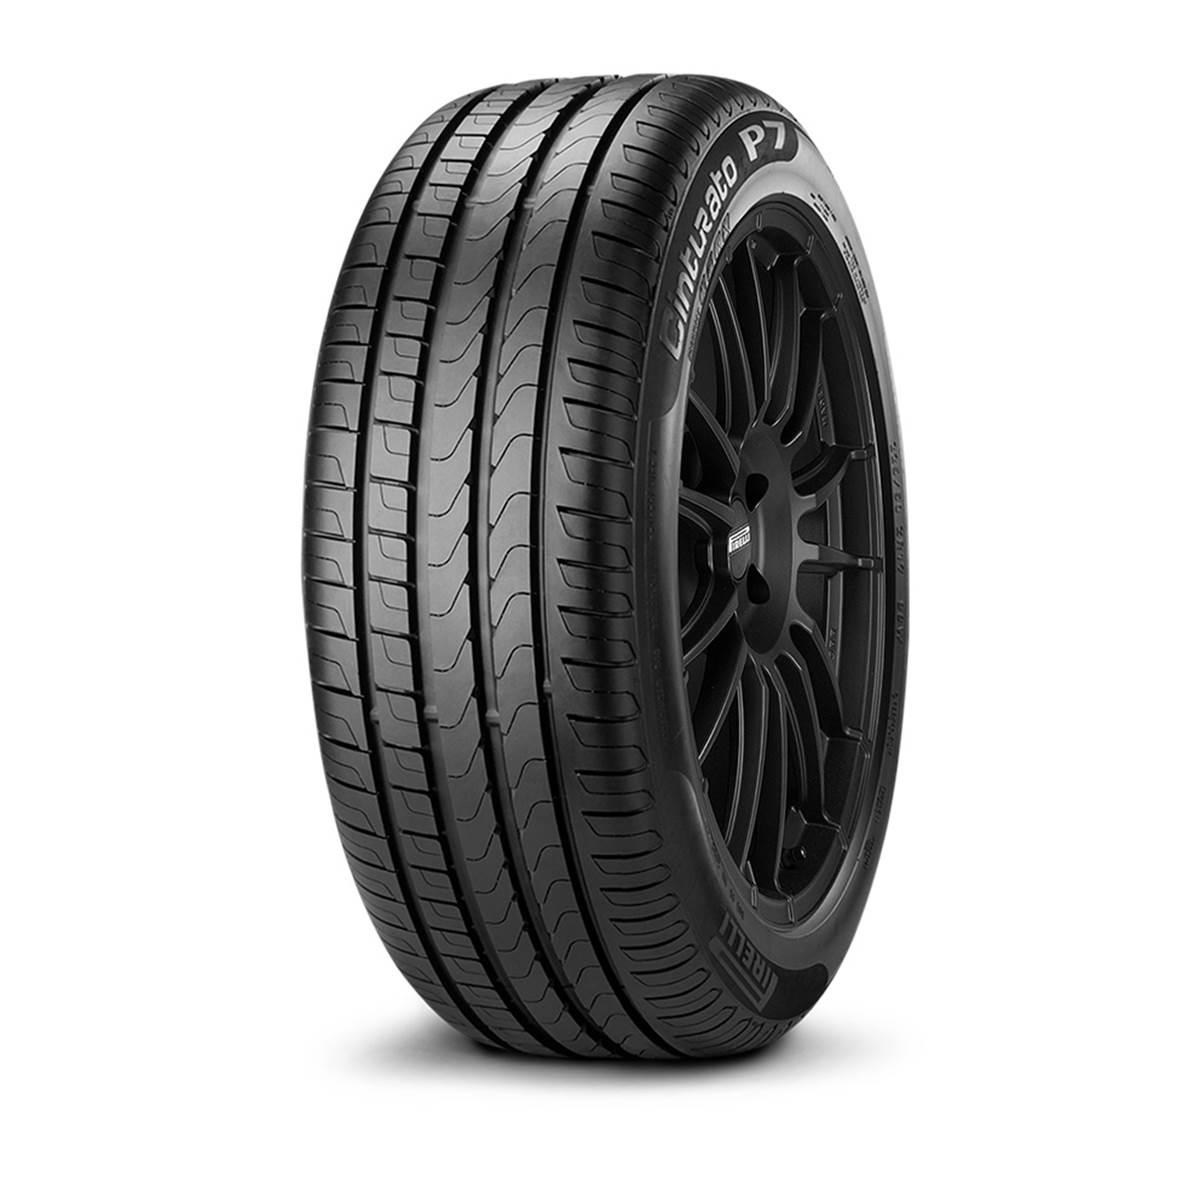 Pneu Runflat Pirelli 225/45R18 95Y Cinturato P7 XL